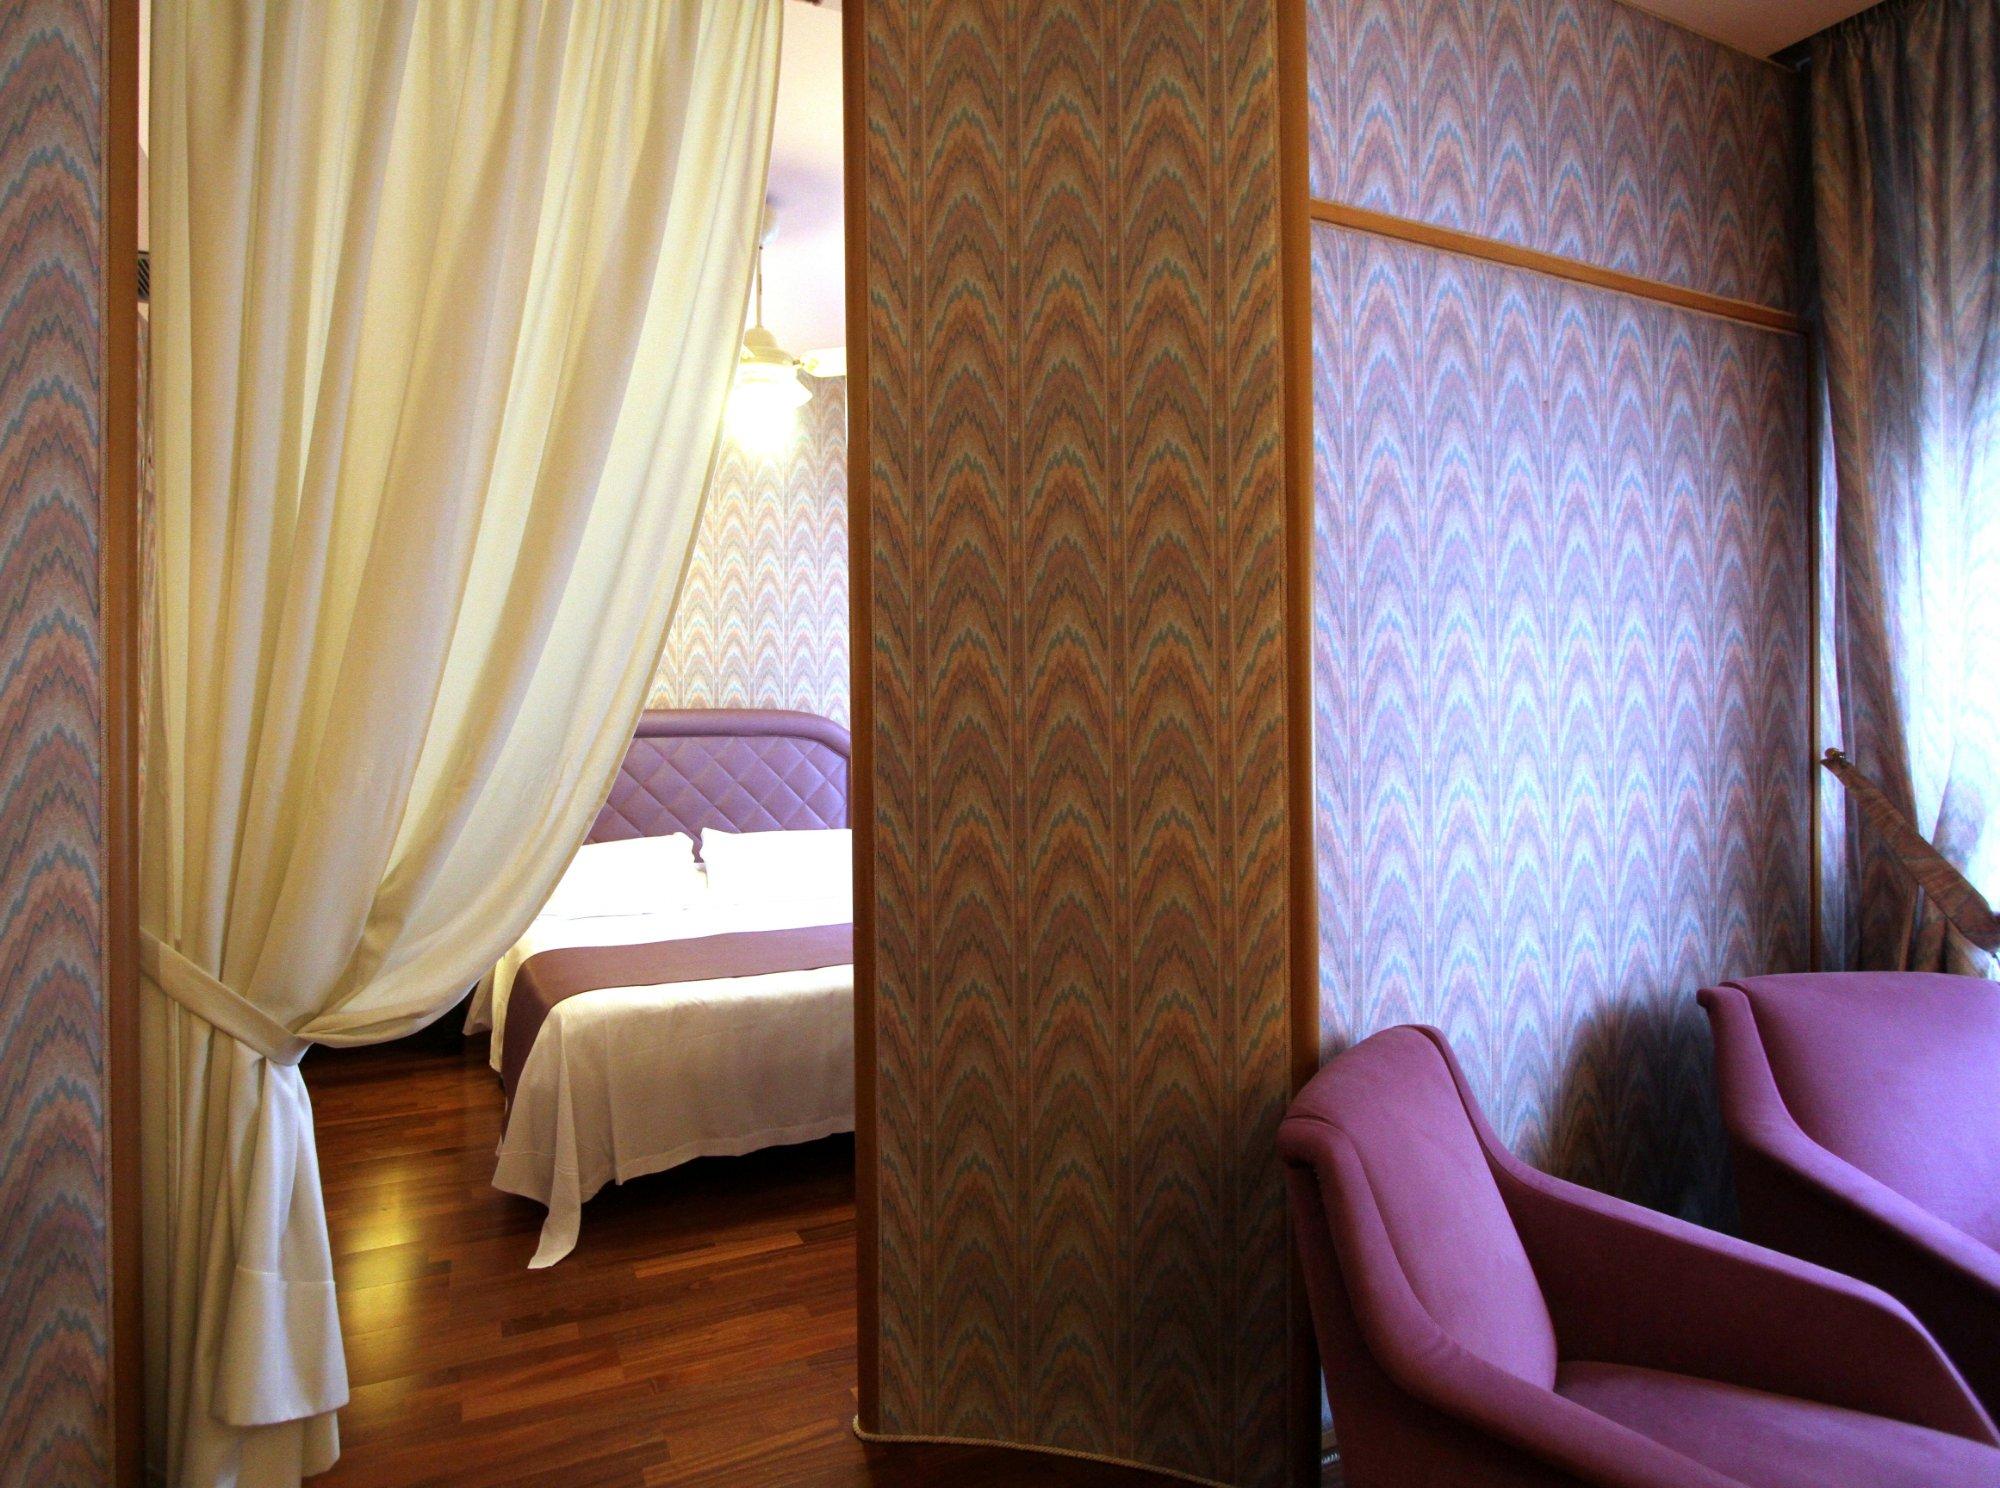 Hotel Cicolella Foggia